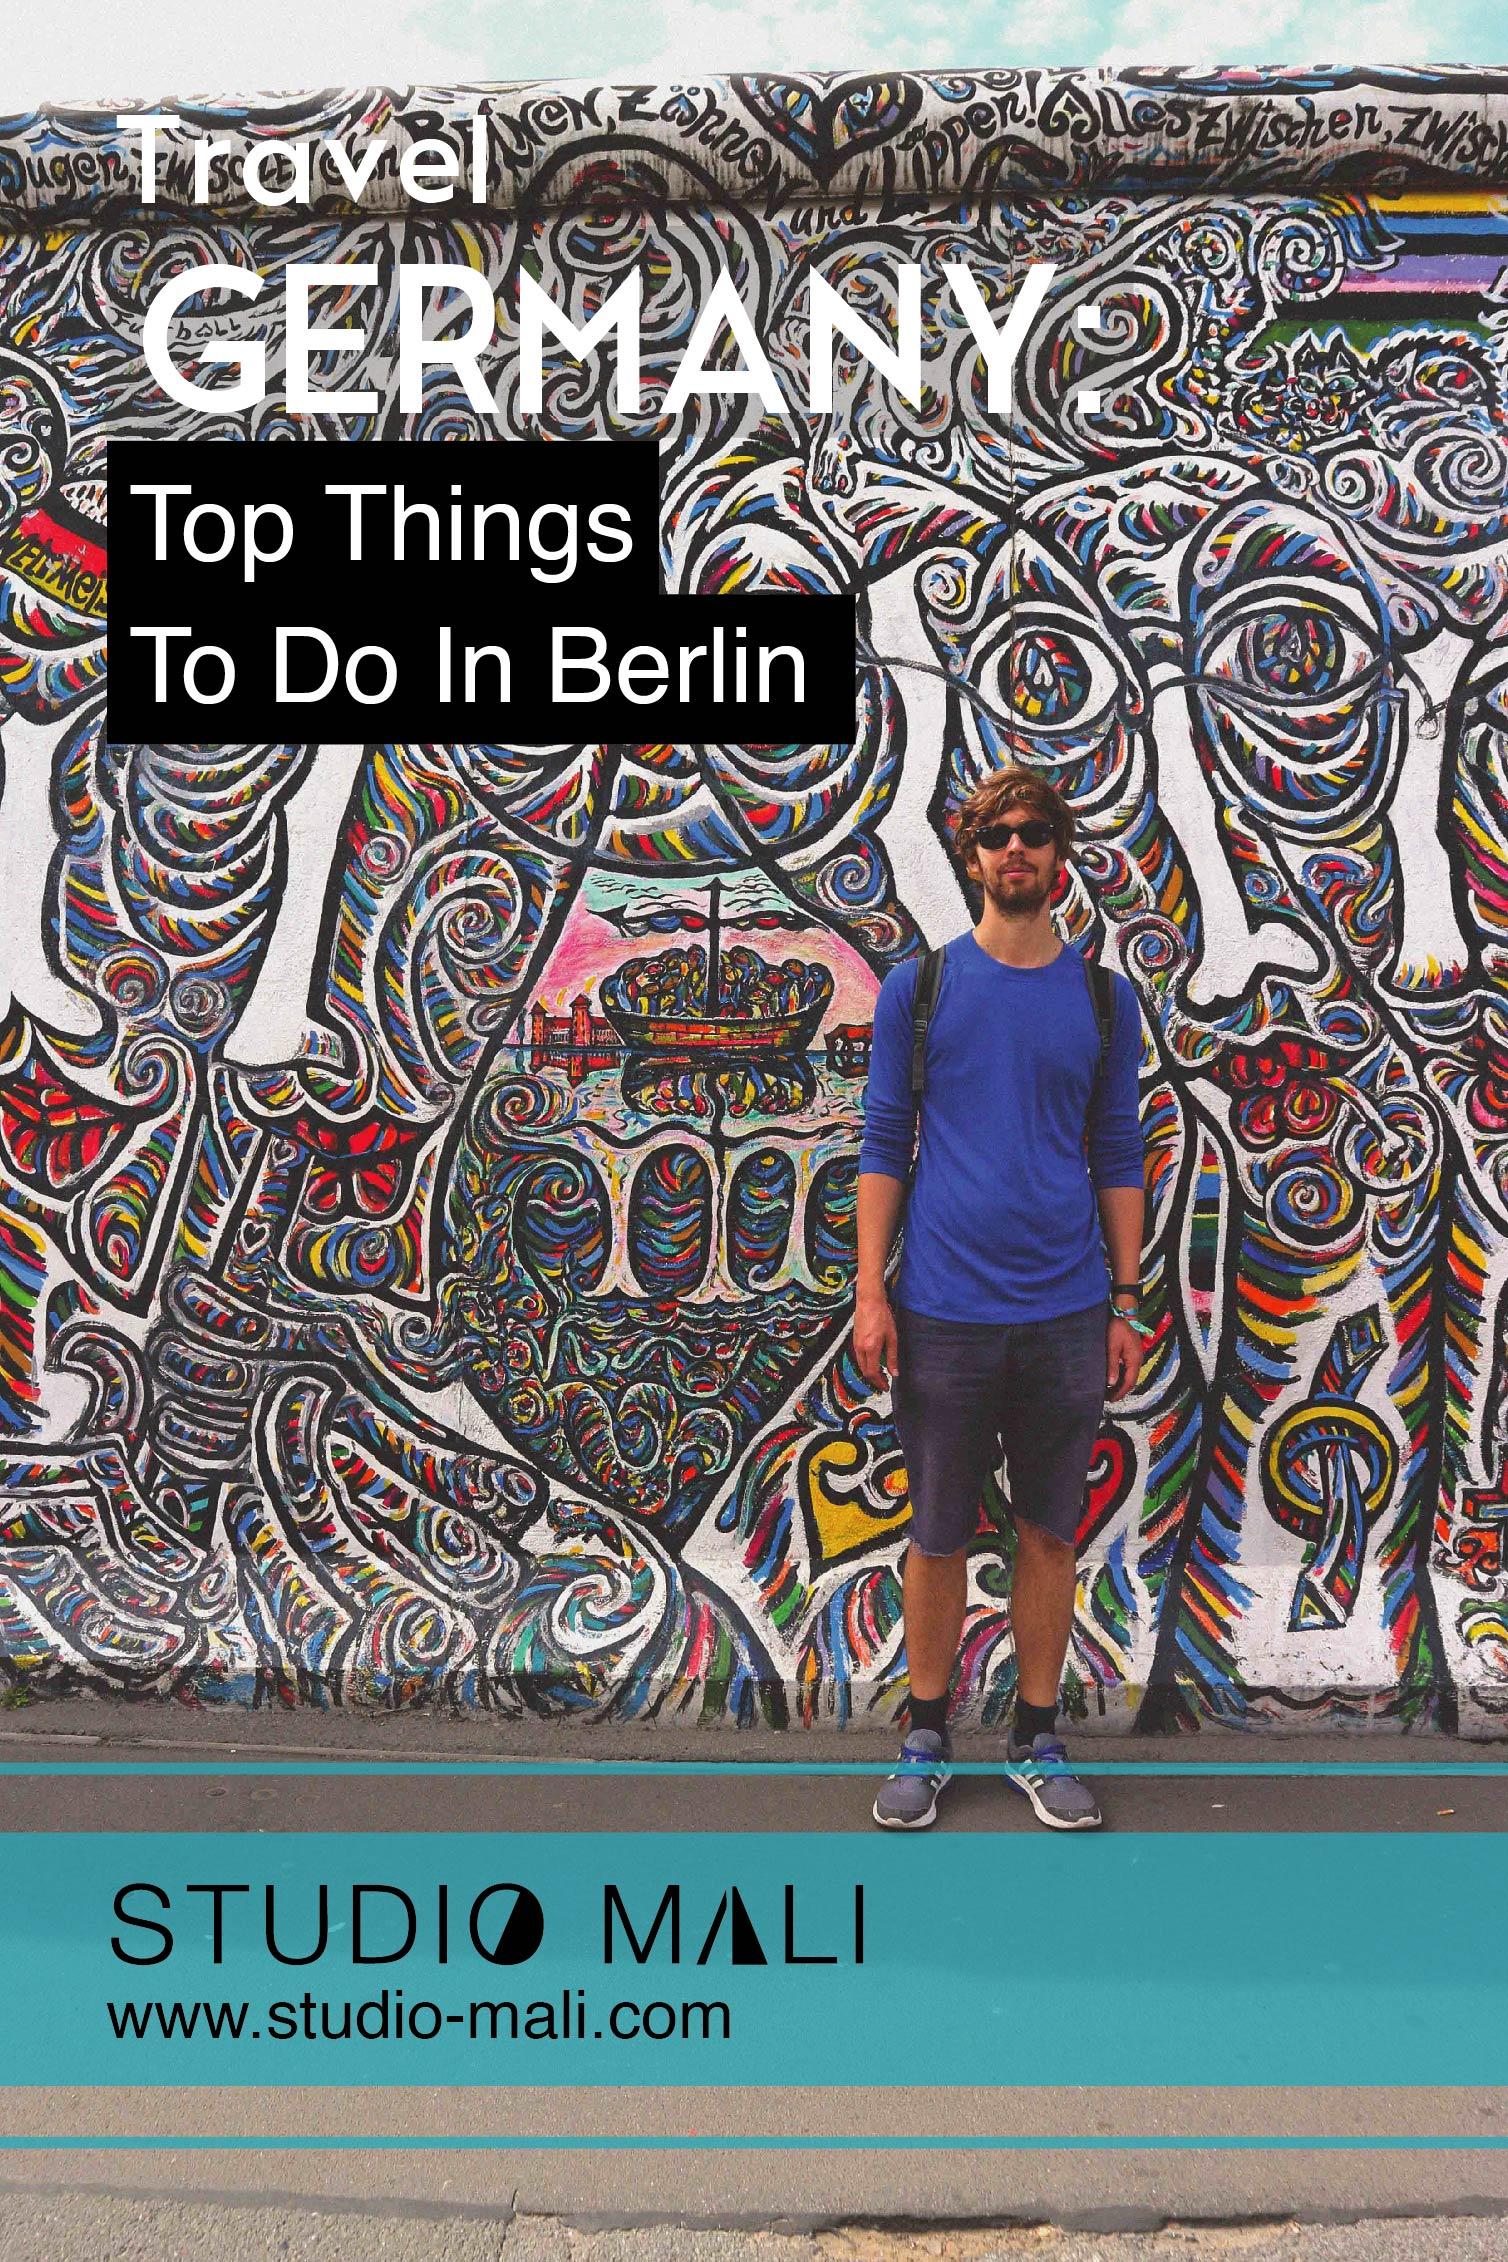 Germany - Top Things To Do In Berlin, by Studio Mali.jpg